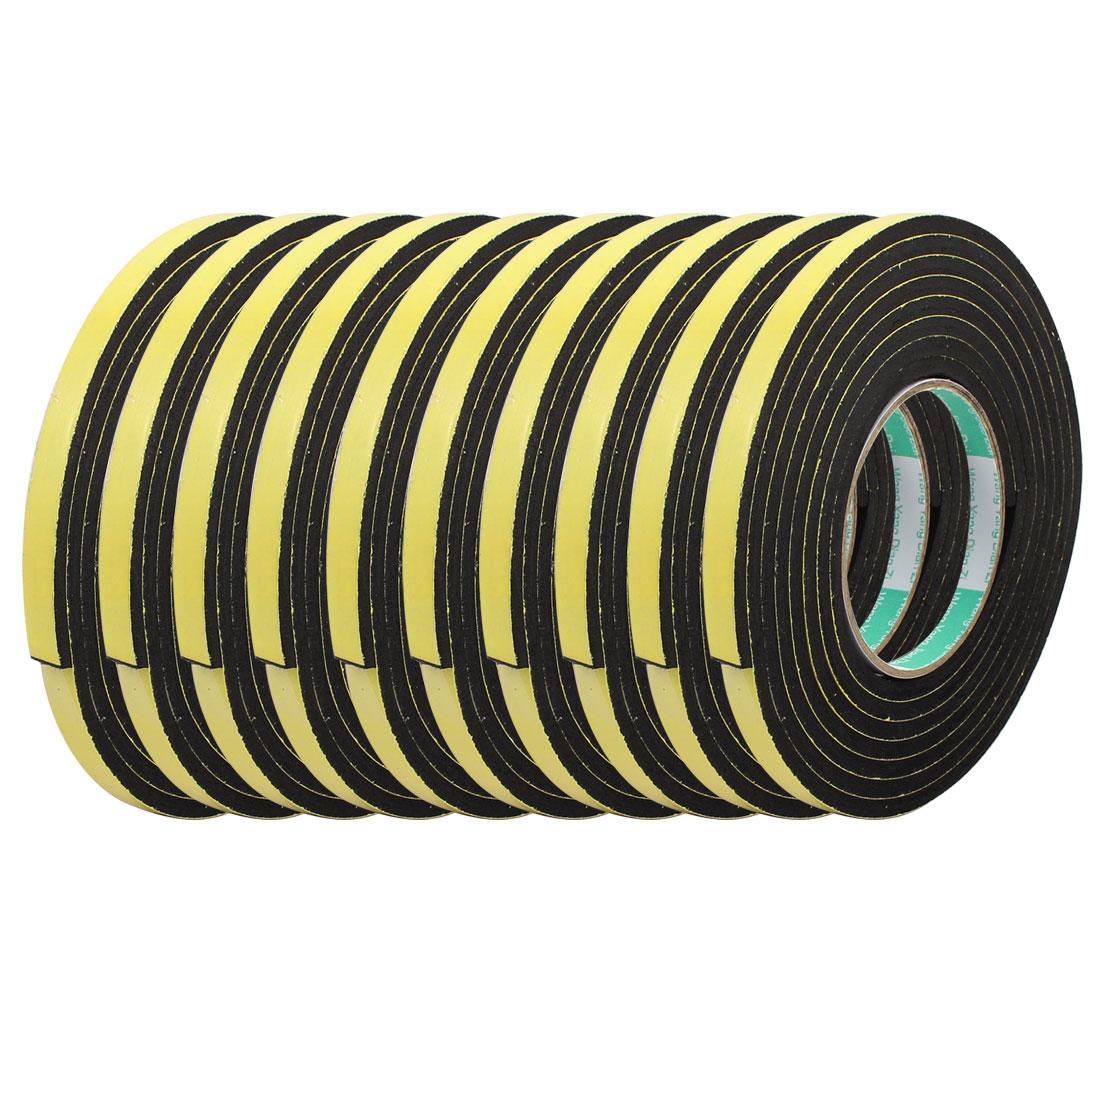 10pcs 3Meter 10mm x 5mm Single-side Adhesive Shockproof Sponge Foam Tape Yellow